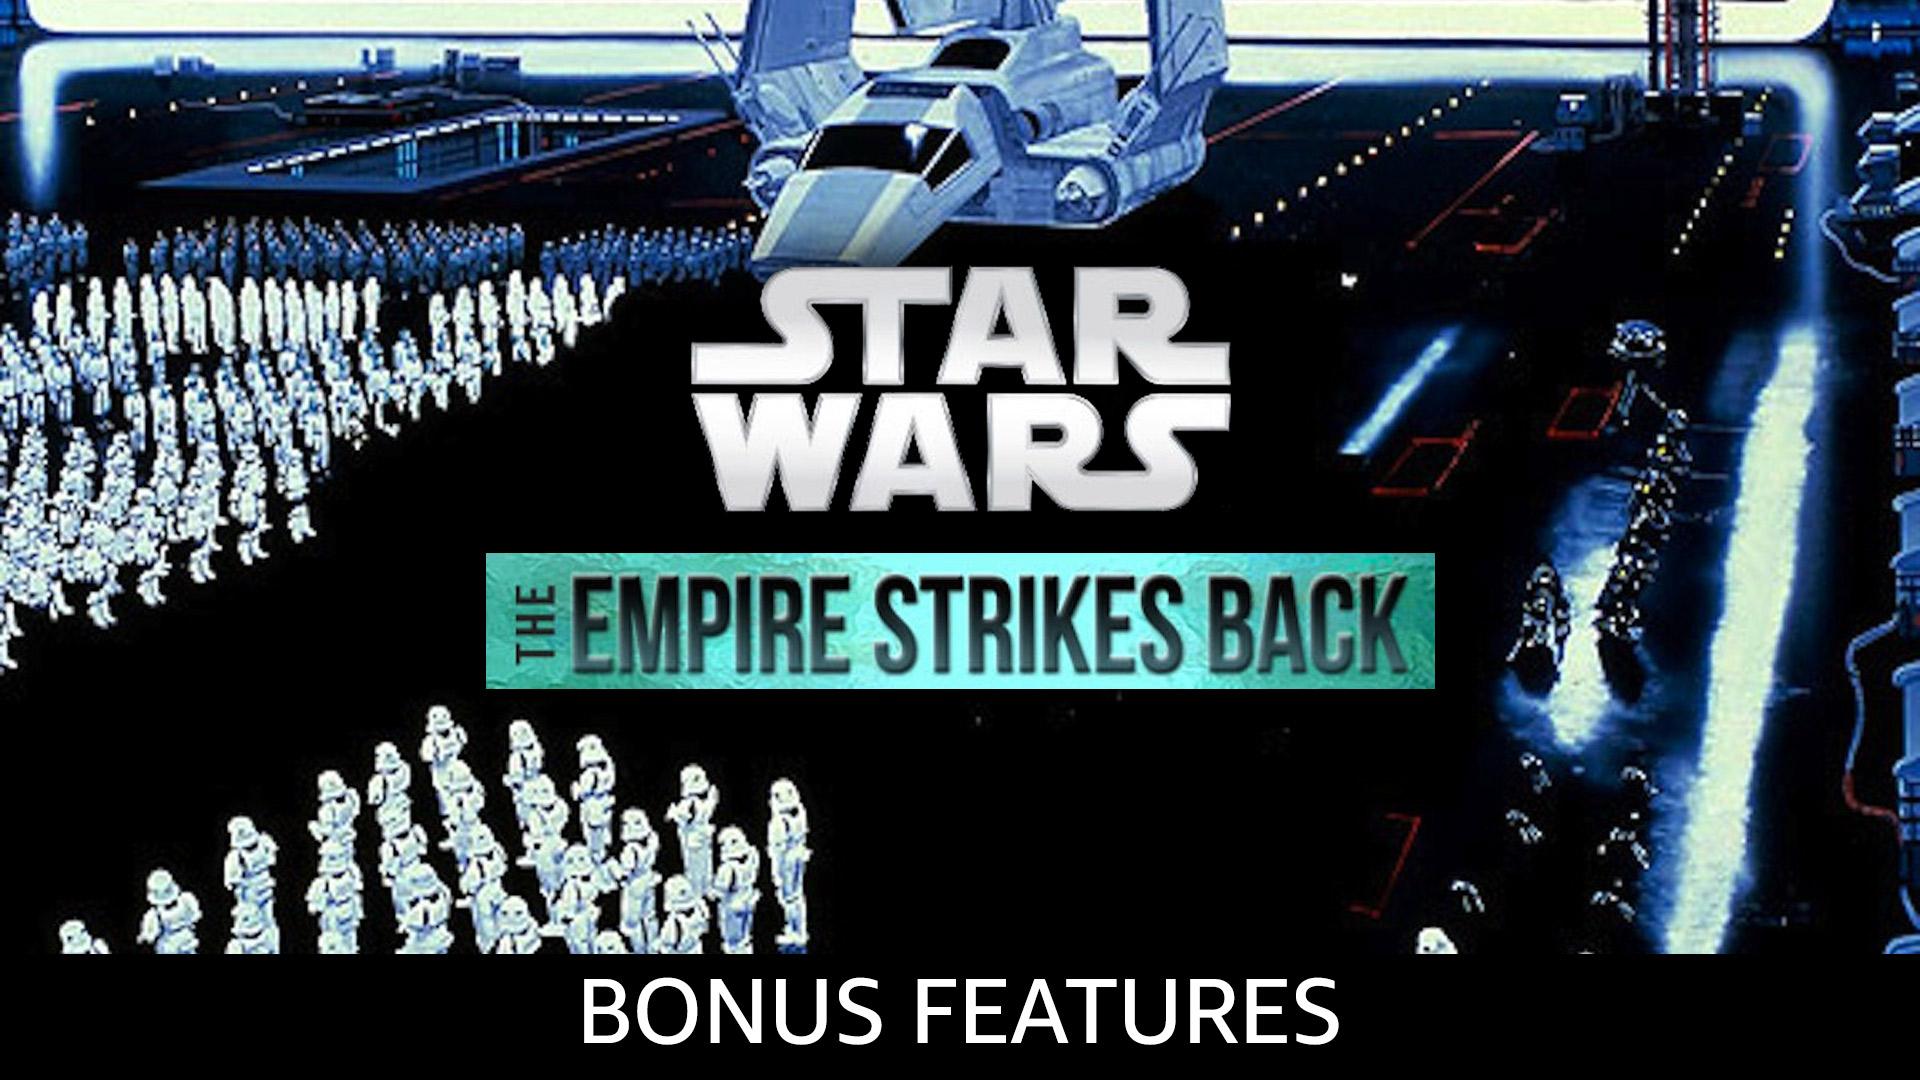 Star Wars: The Empire Strikes Back Bonusmaterial